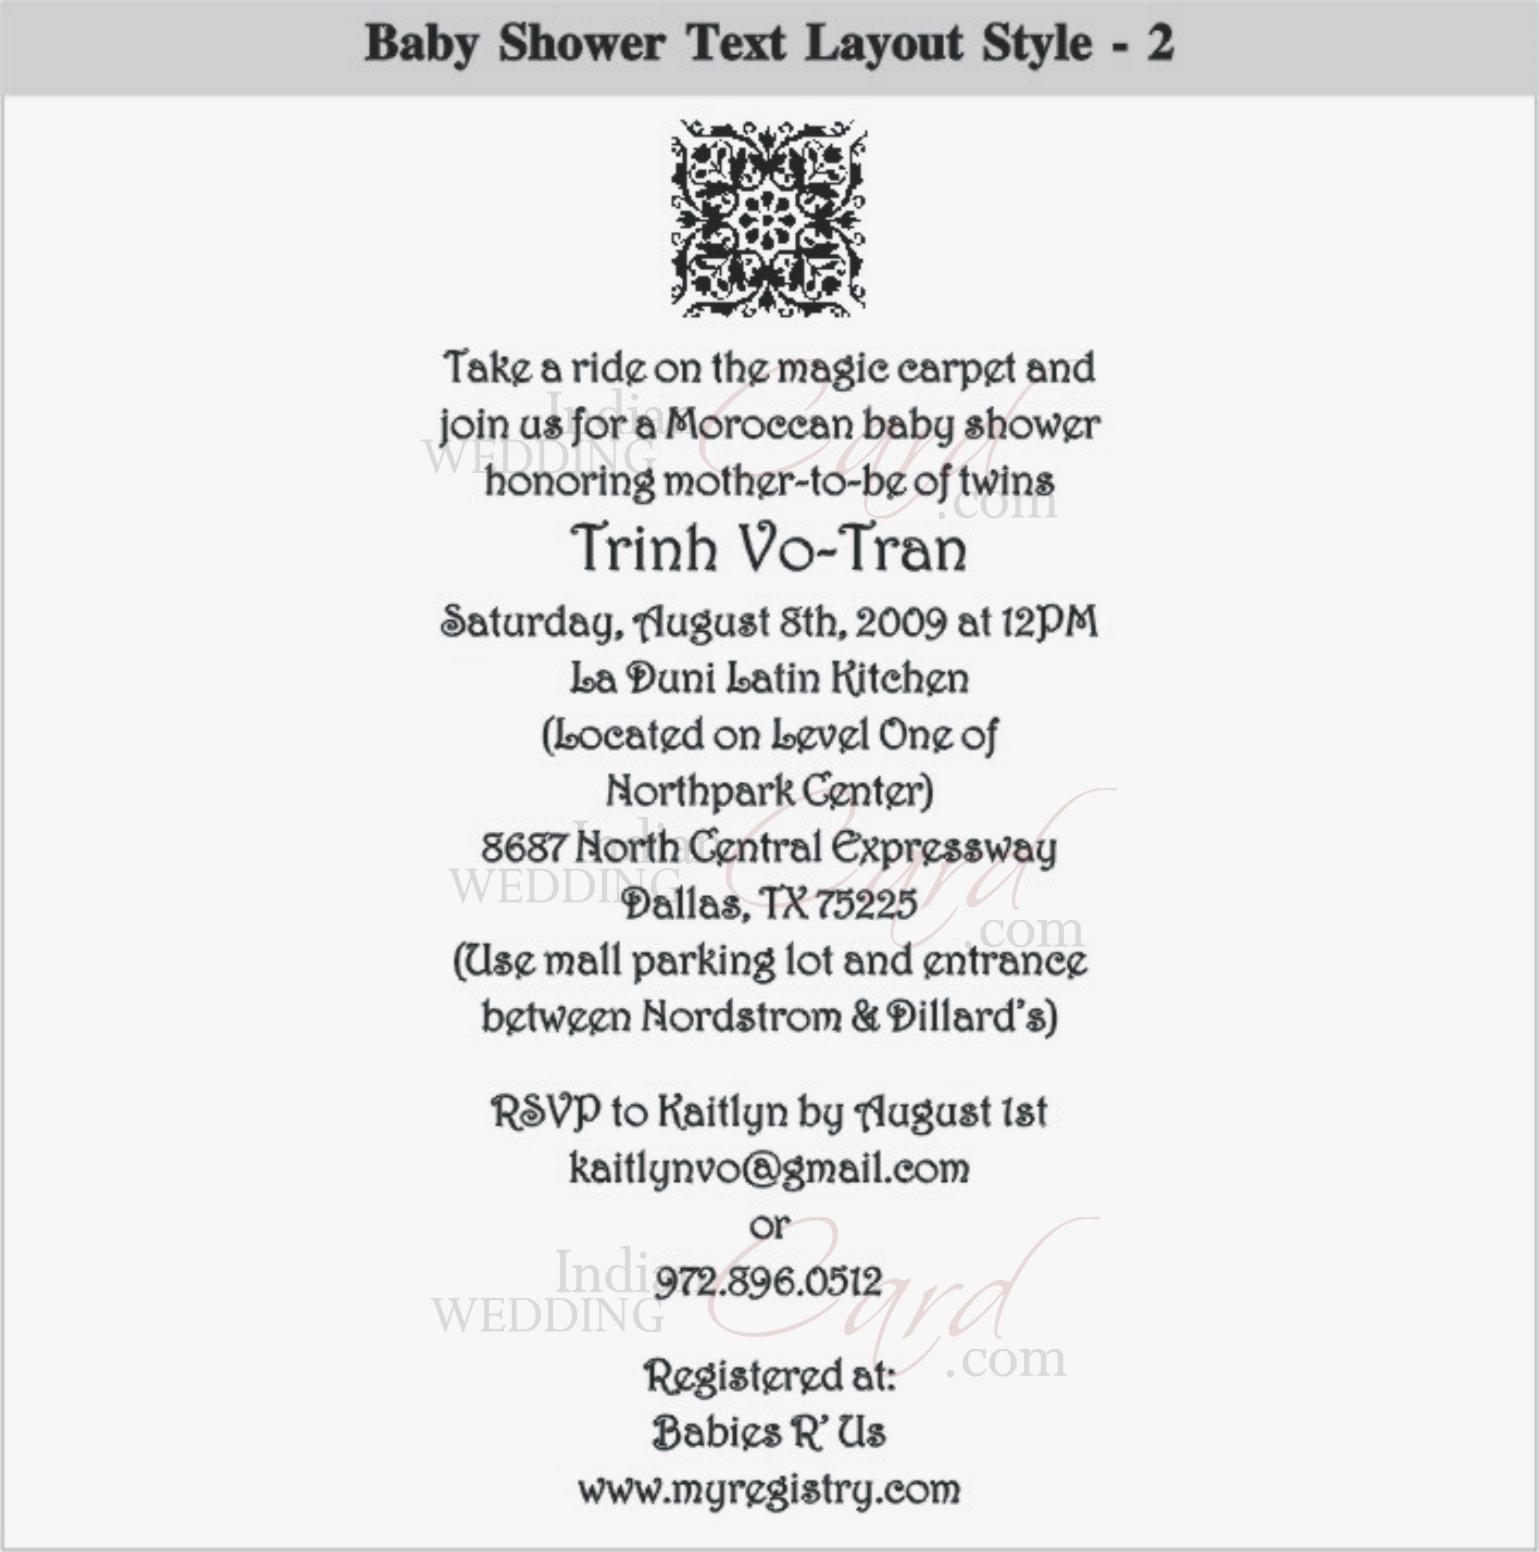 Indianweddingcard baby shower layout 2 filmwisefo